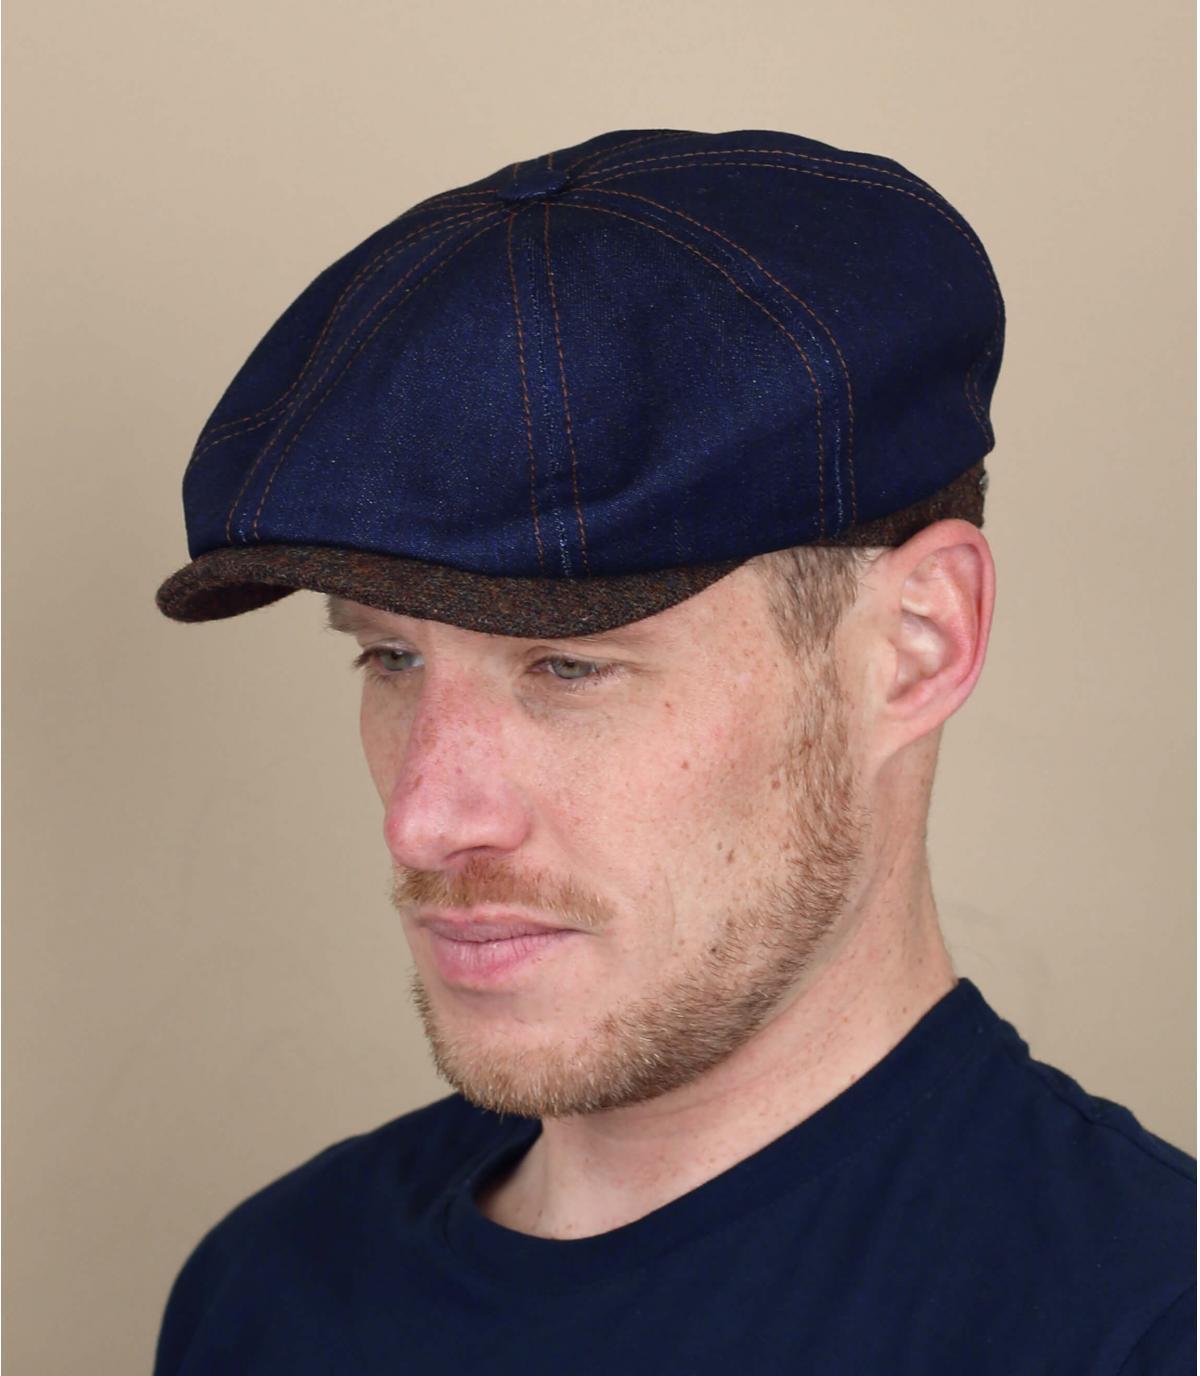 blauwe jeans krantenverkoper cap